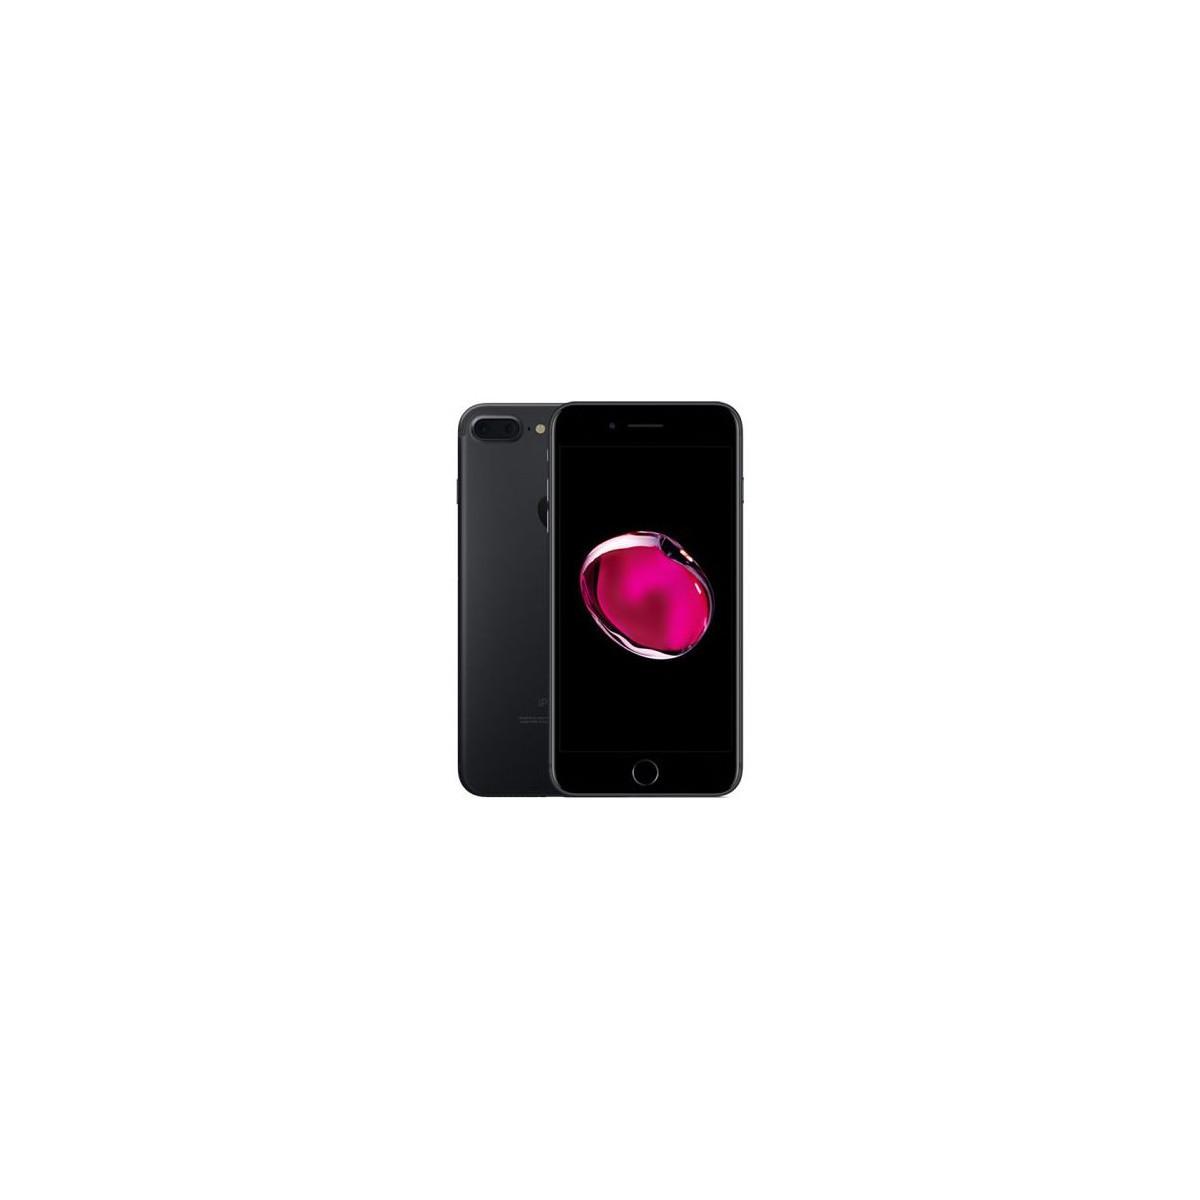 Apple iPhone 7 Plus 256Gb Black (черный)